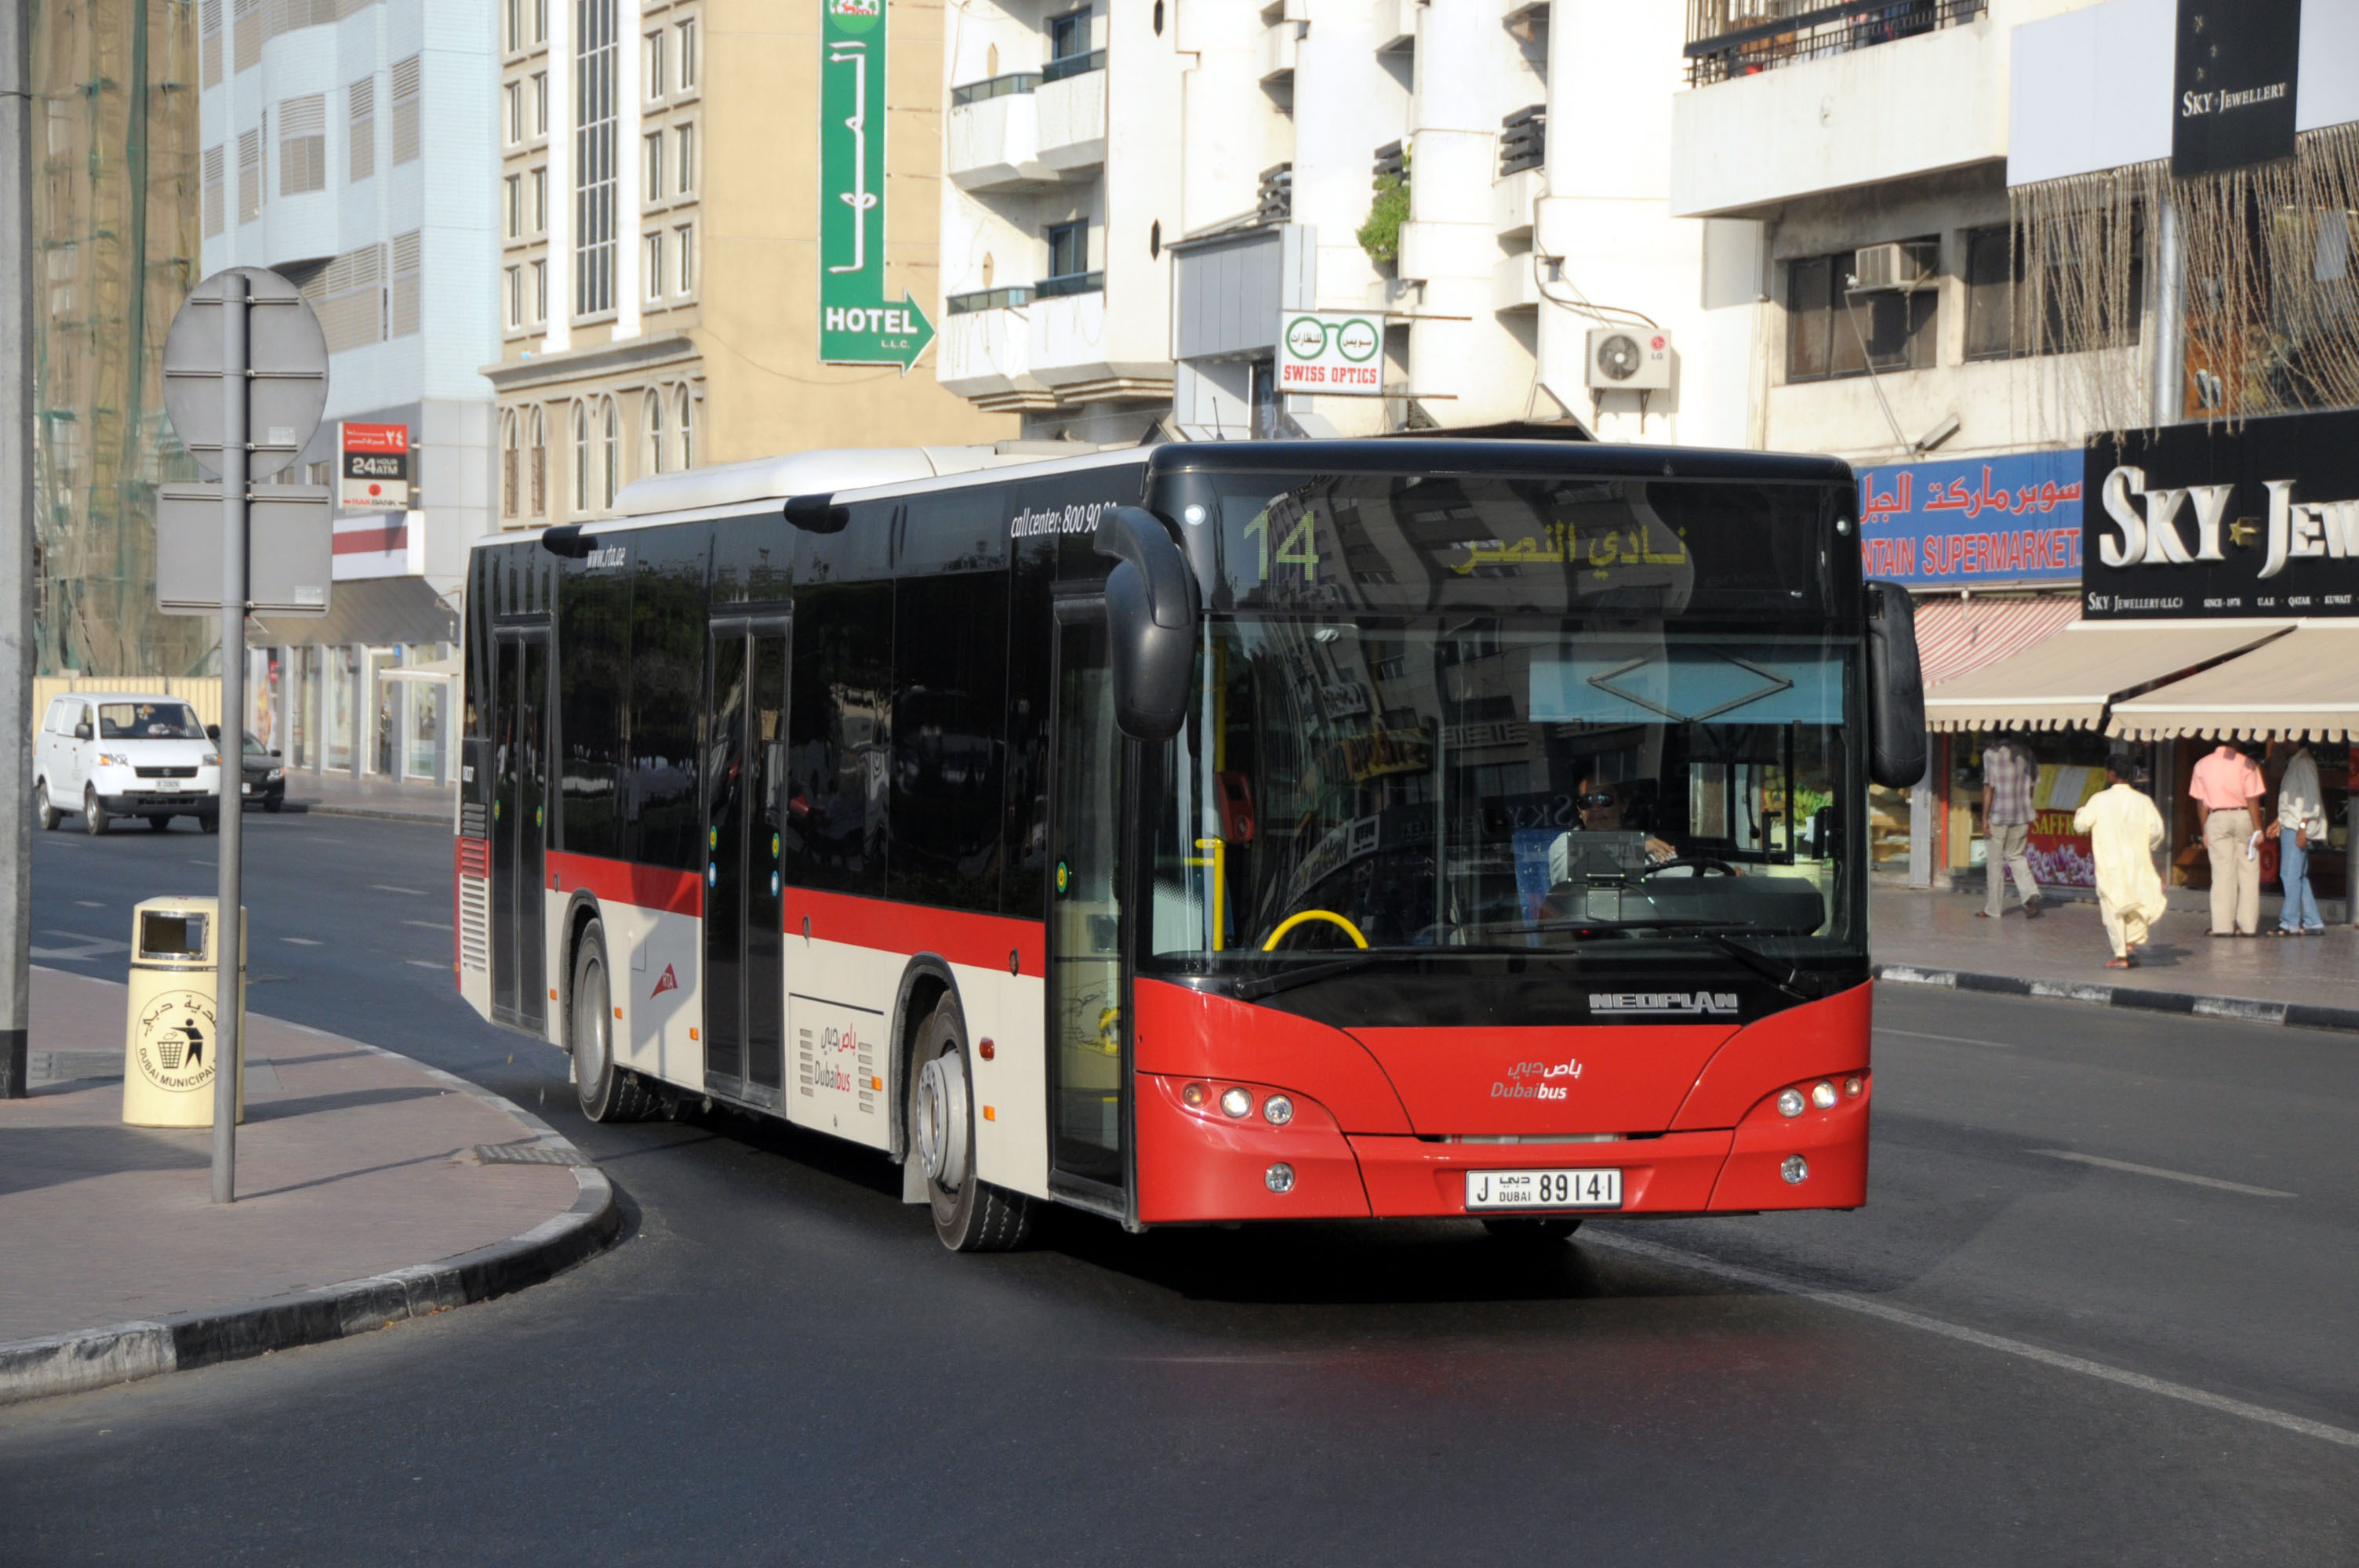 Inter City Bus Ridership From Dubai To Sharjah Records